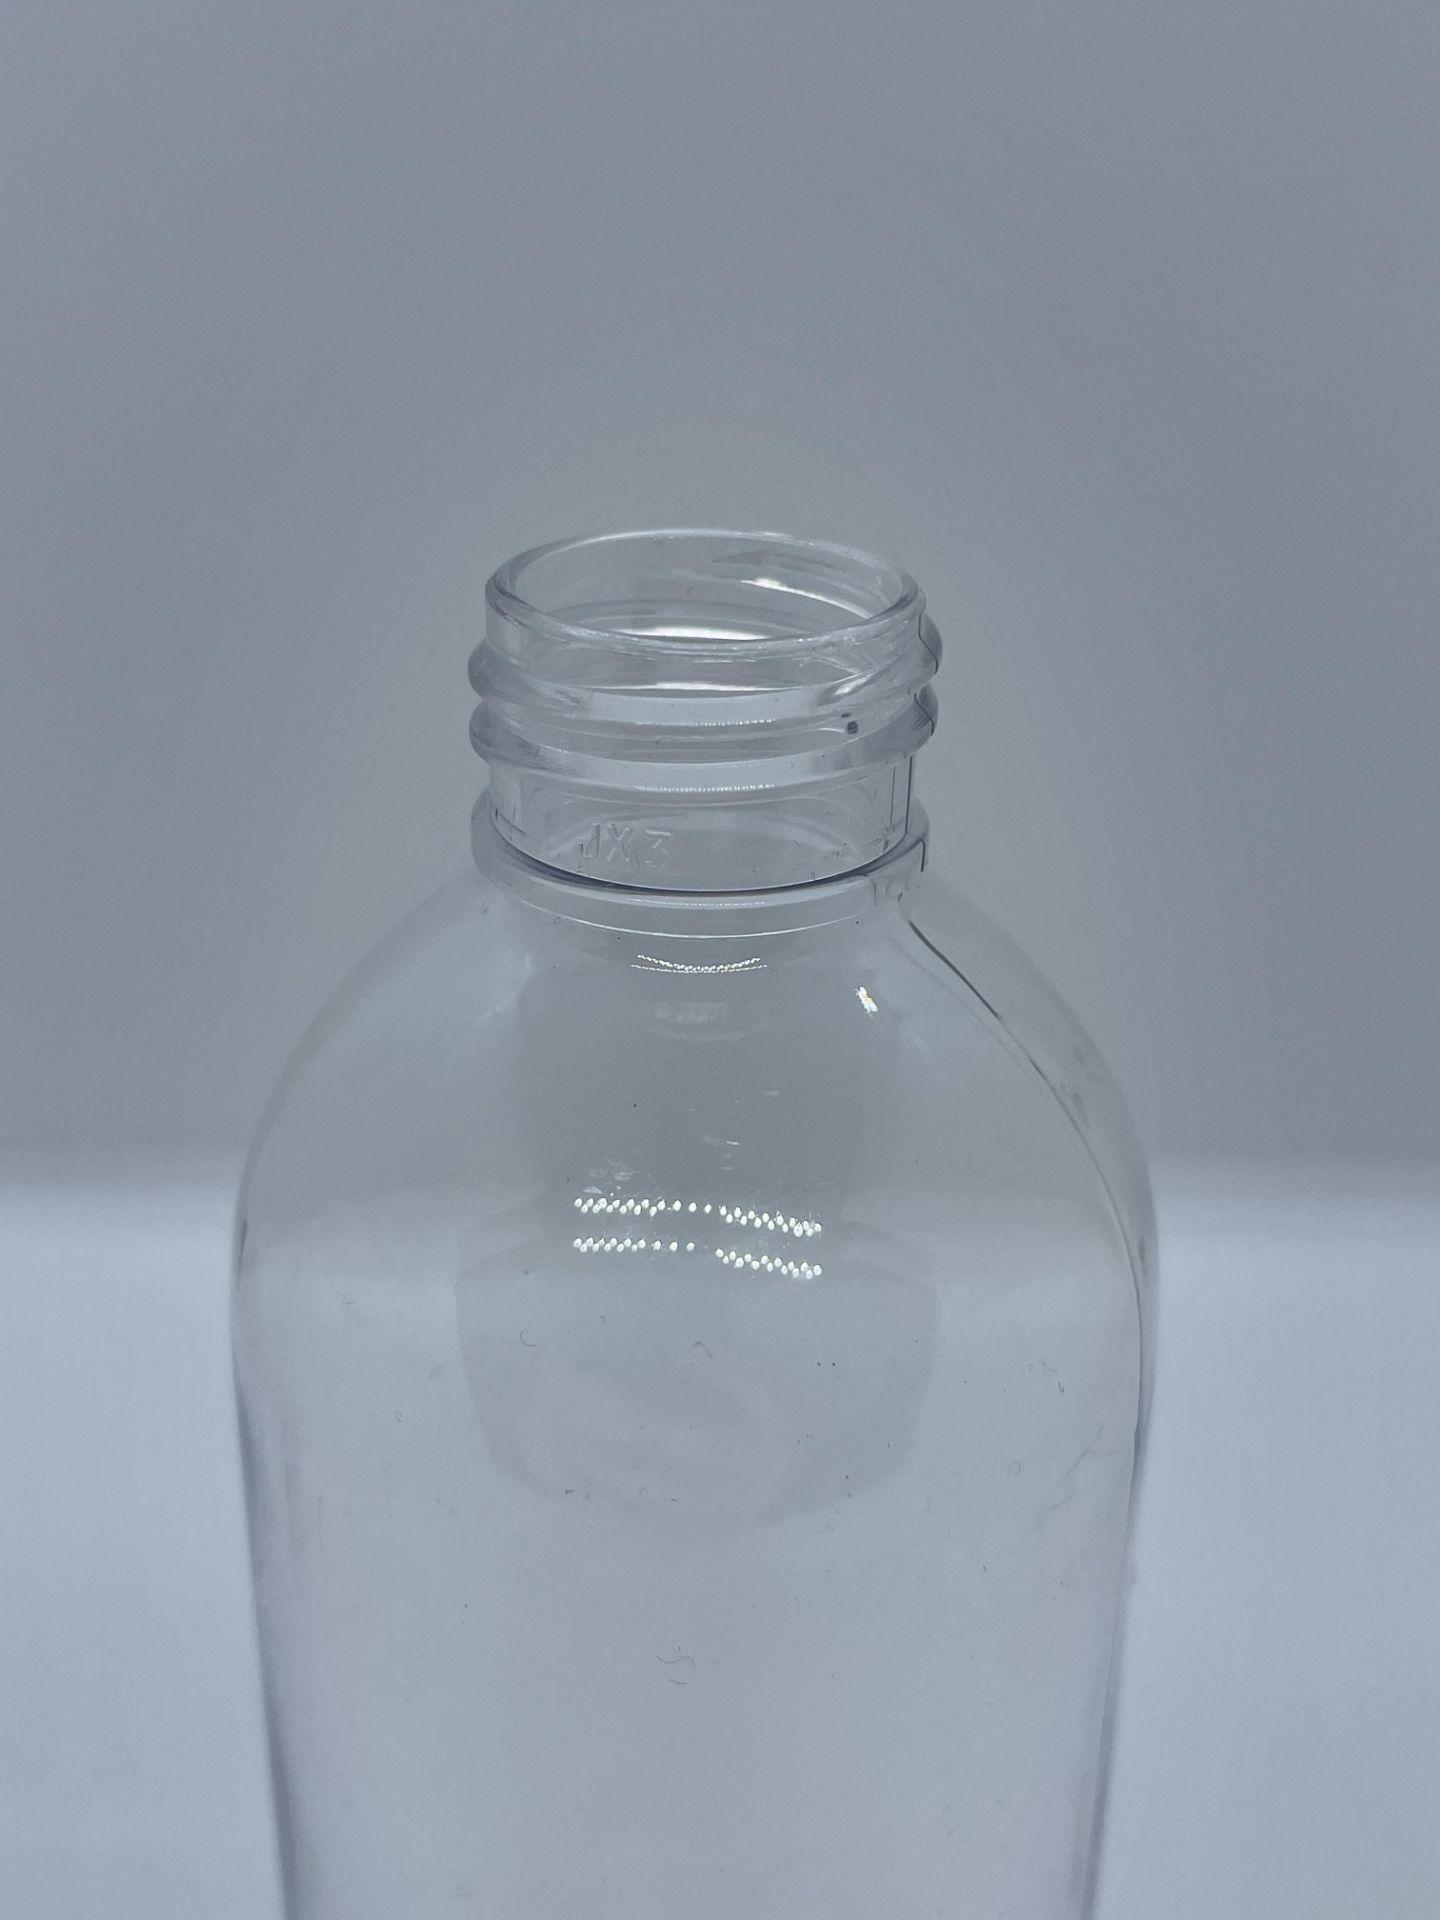 "75,000 - Clear Plastic Bullet 8 oz Empty Bottles, 24-410 Threading Neck, 6.25"" Tall, 2"" Diameter - Image 4 of 5"